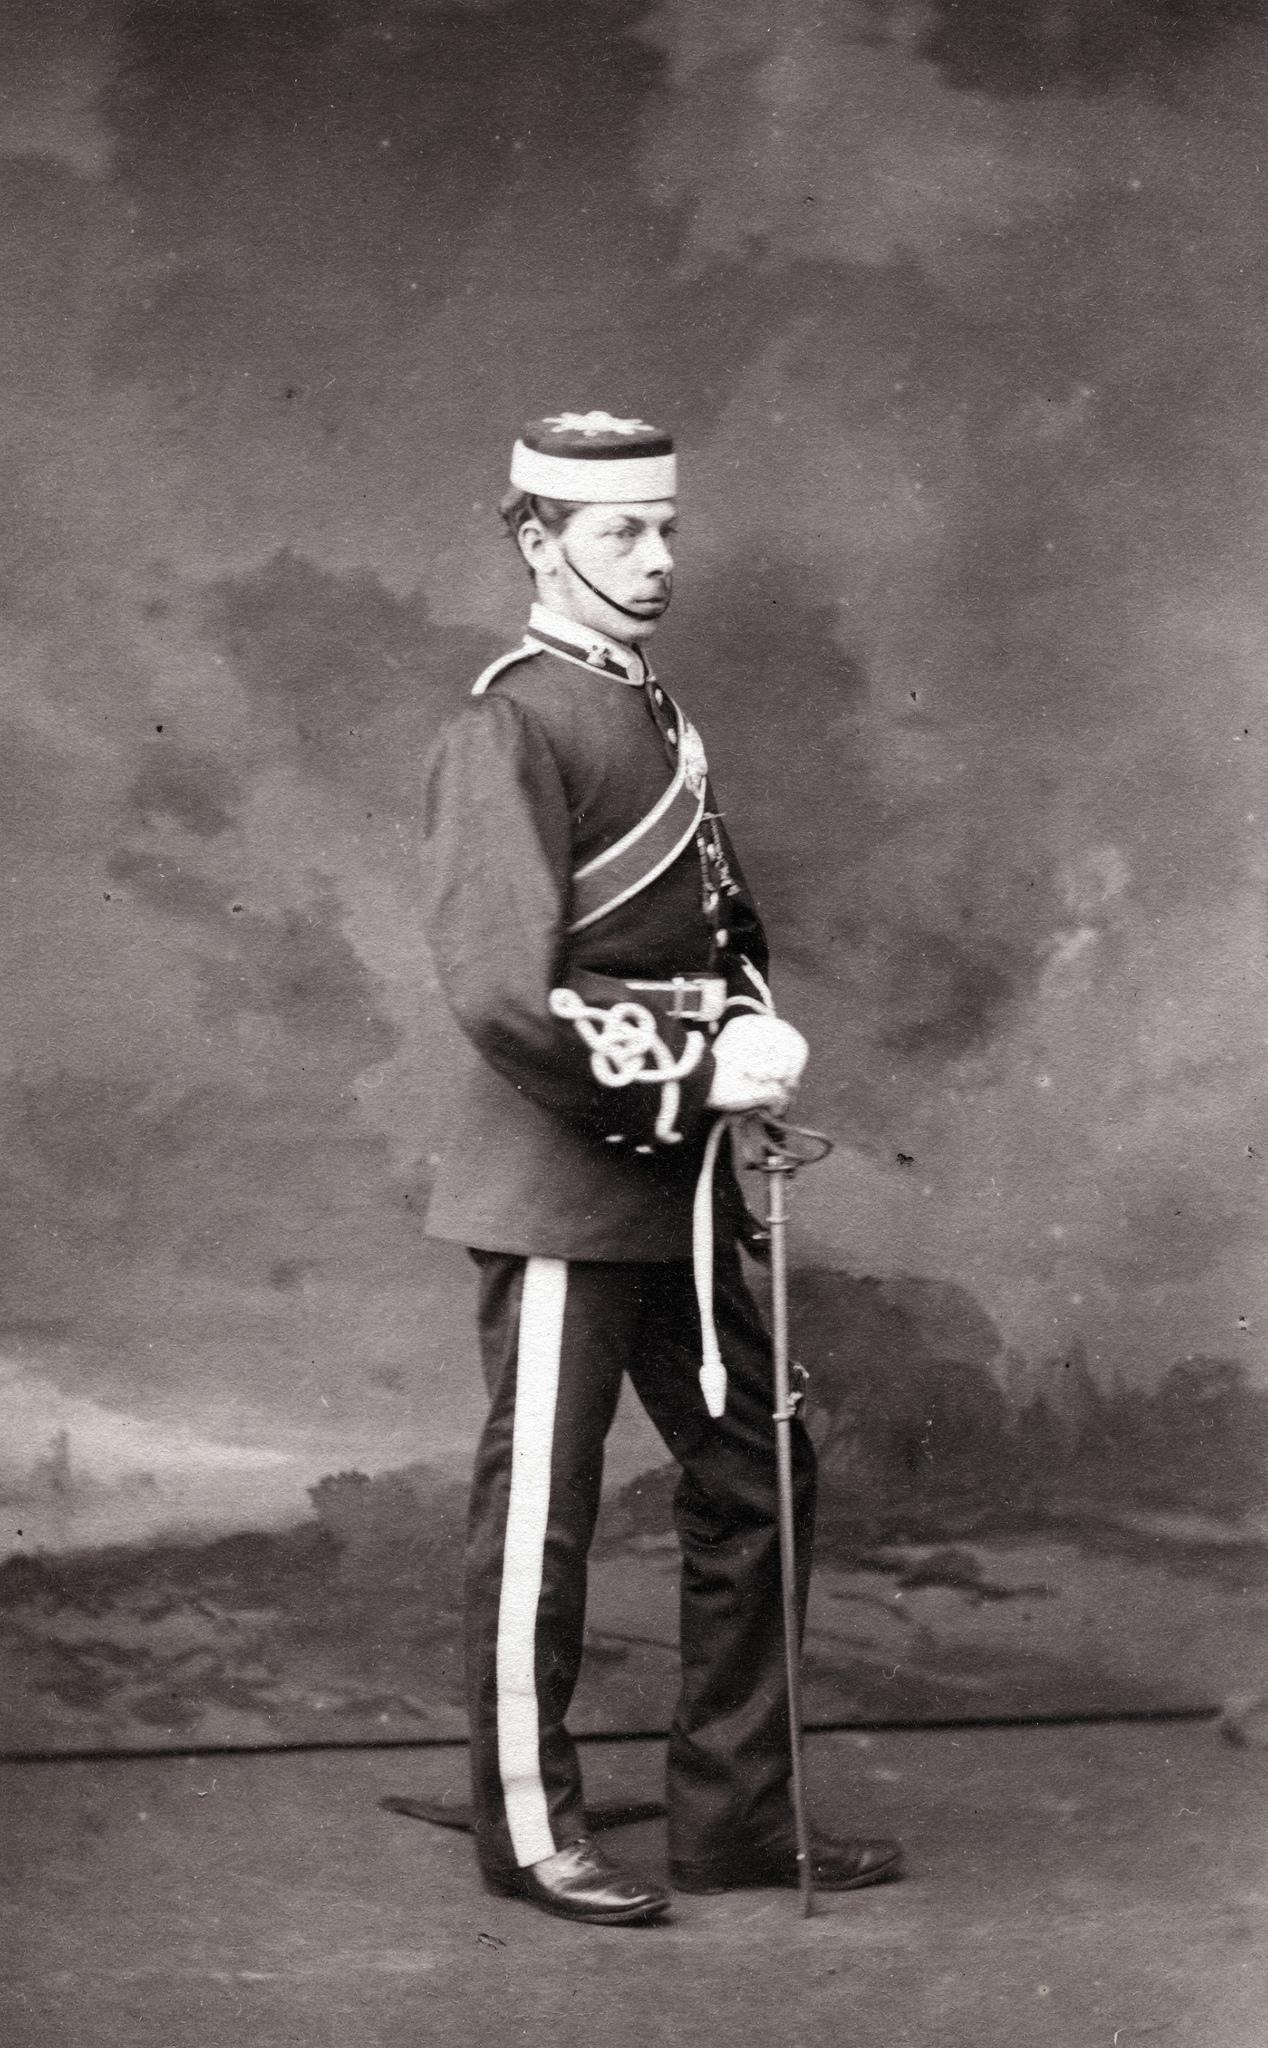 1865. Британский солдат